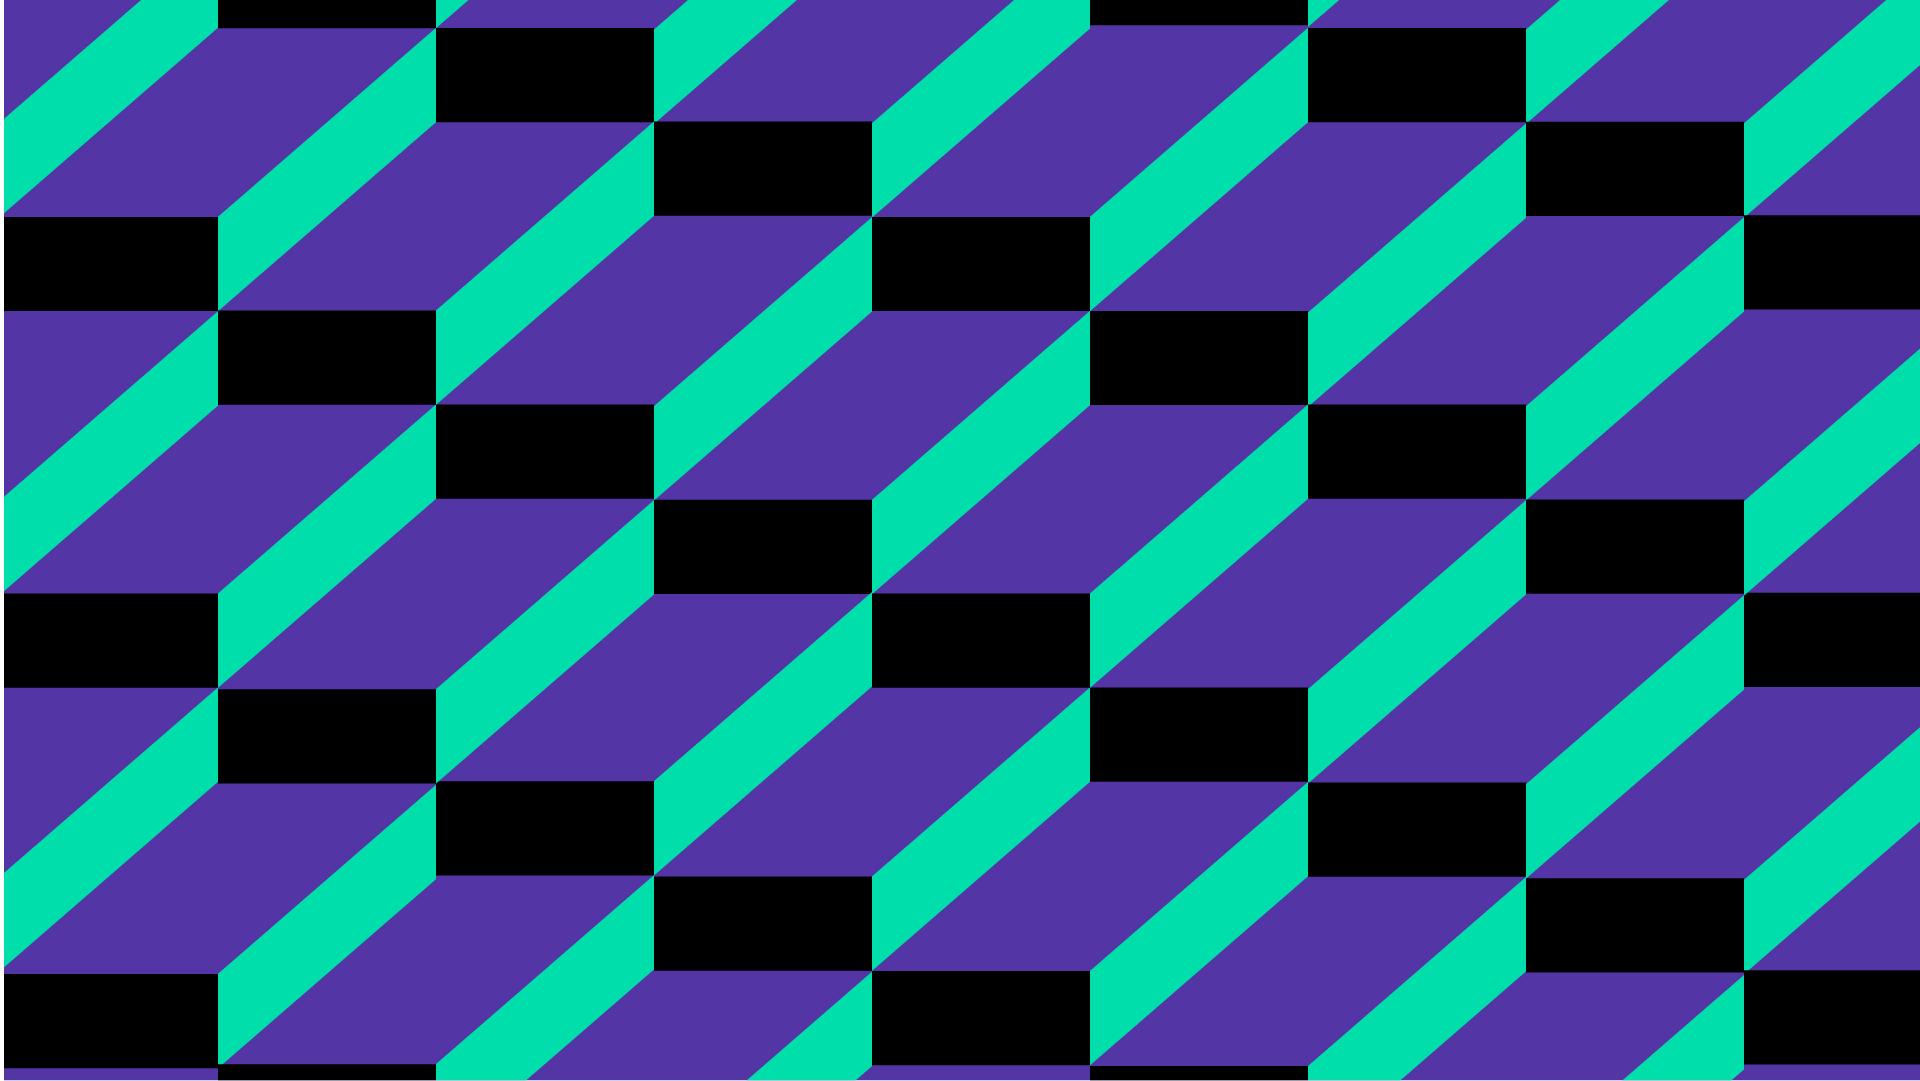 WH17_Pattern_021.jpg